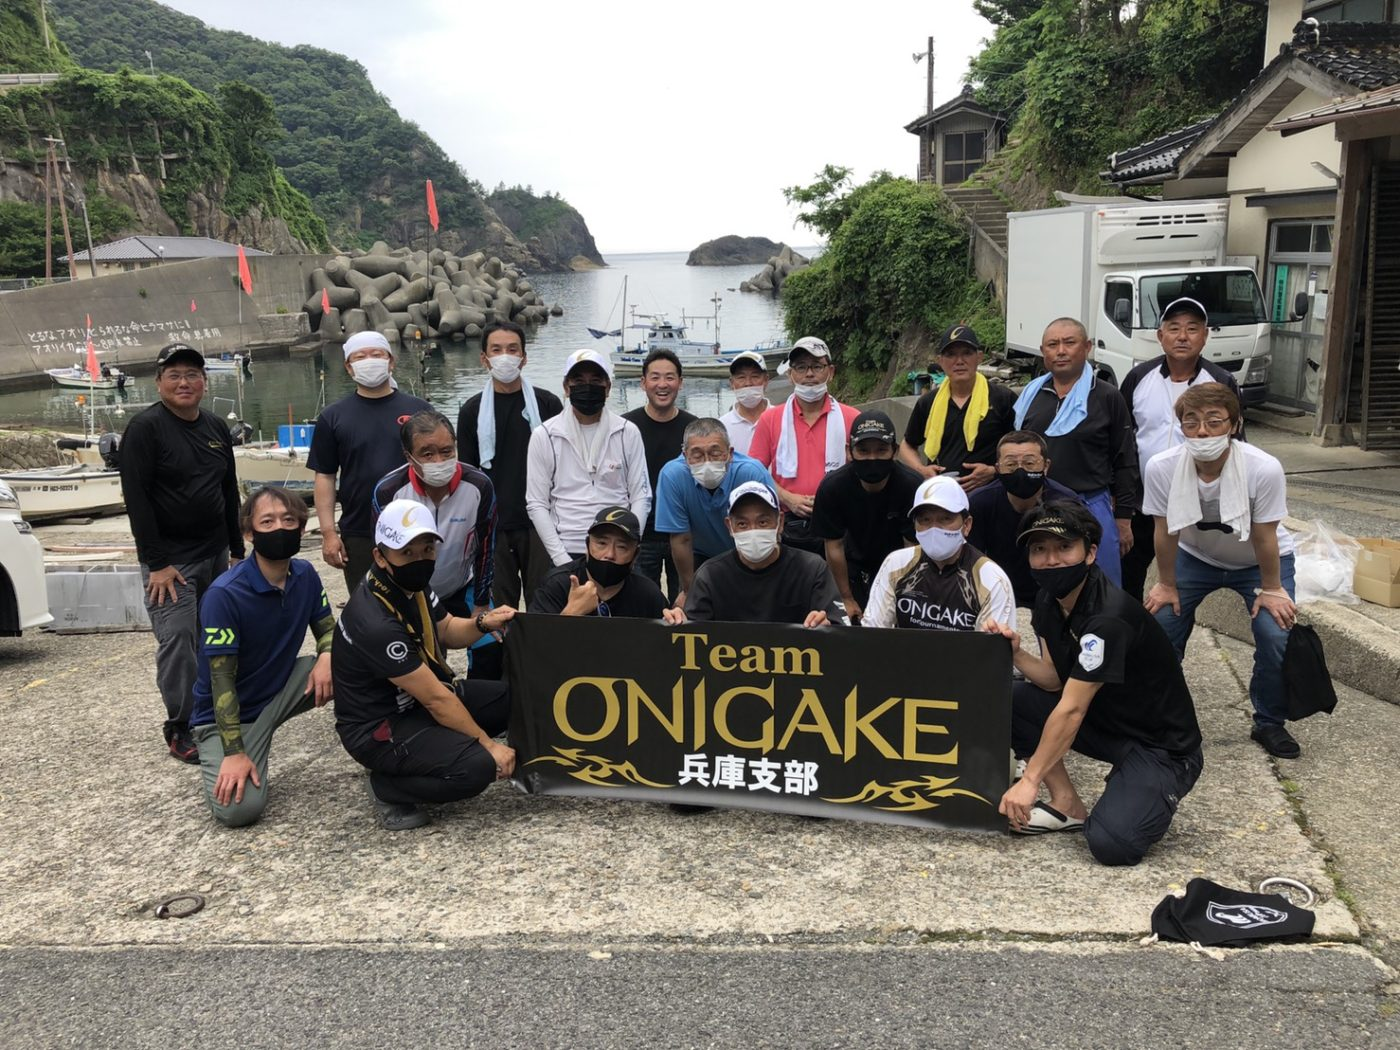 TeamONIGAKE近畿 2021年度兵庫支部第1回 三尾大会